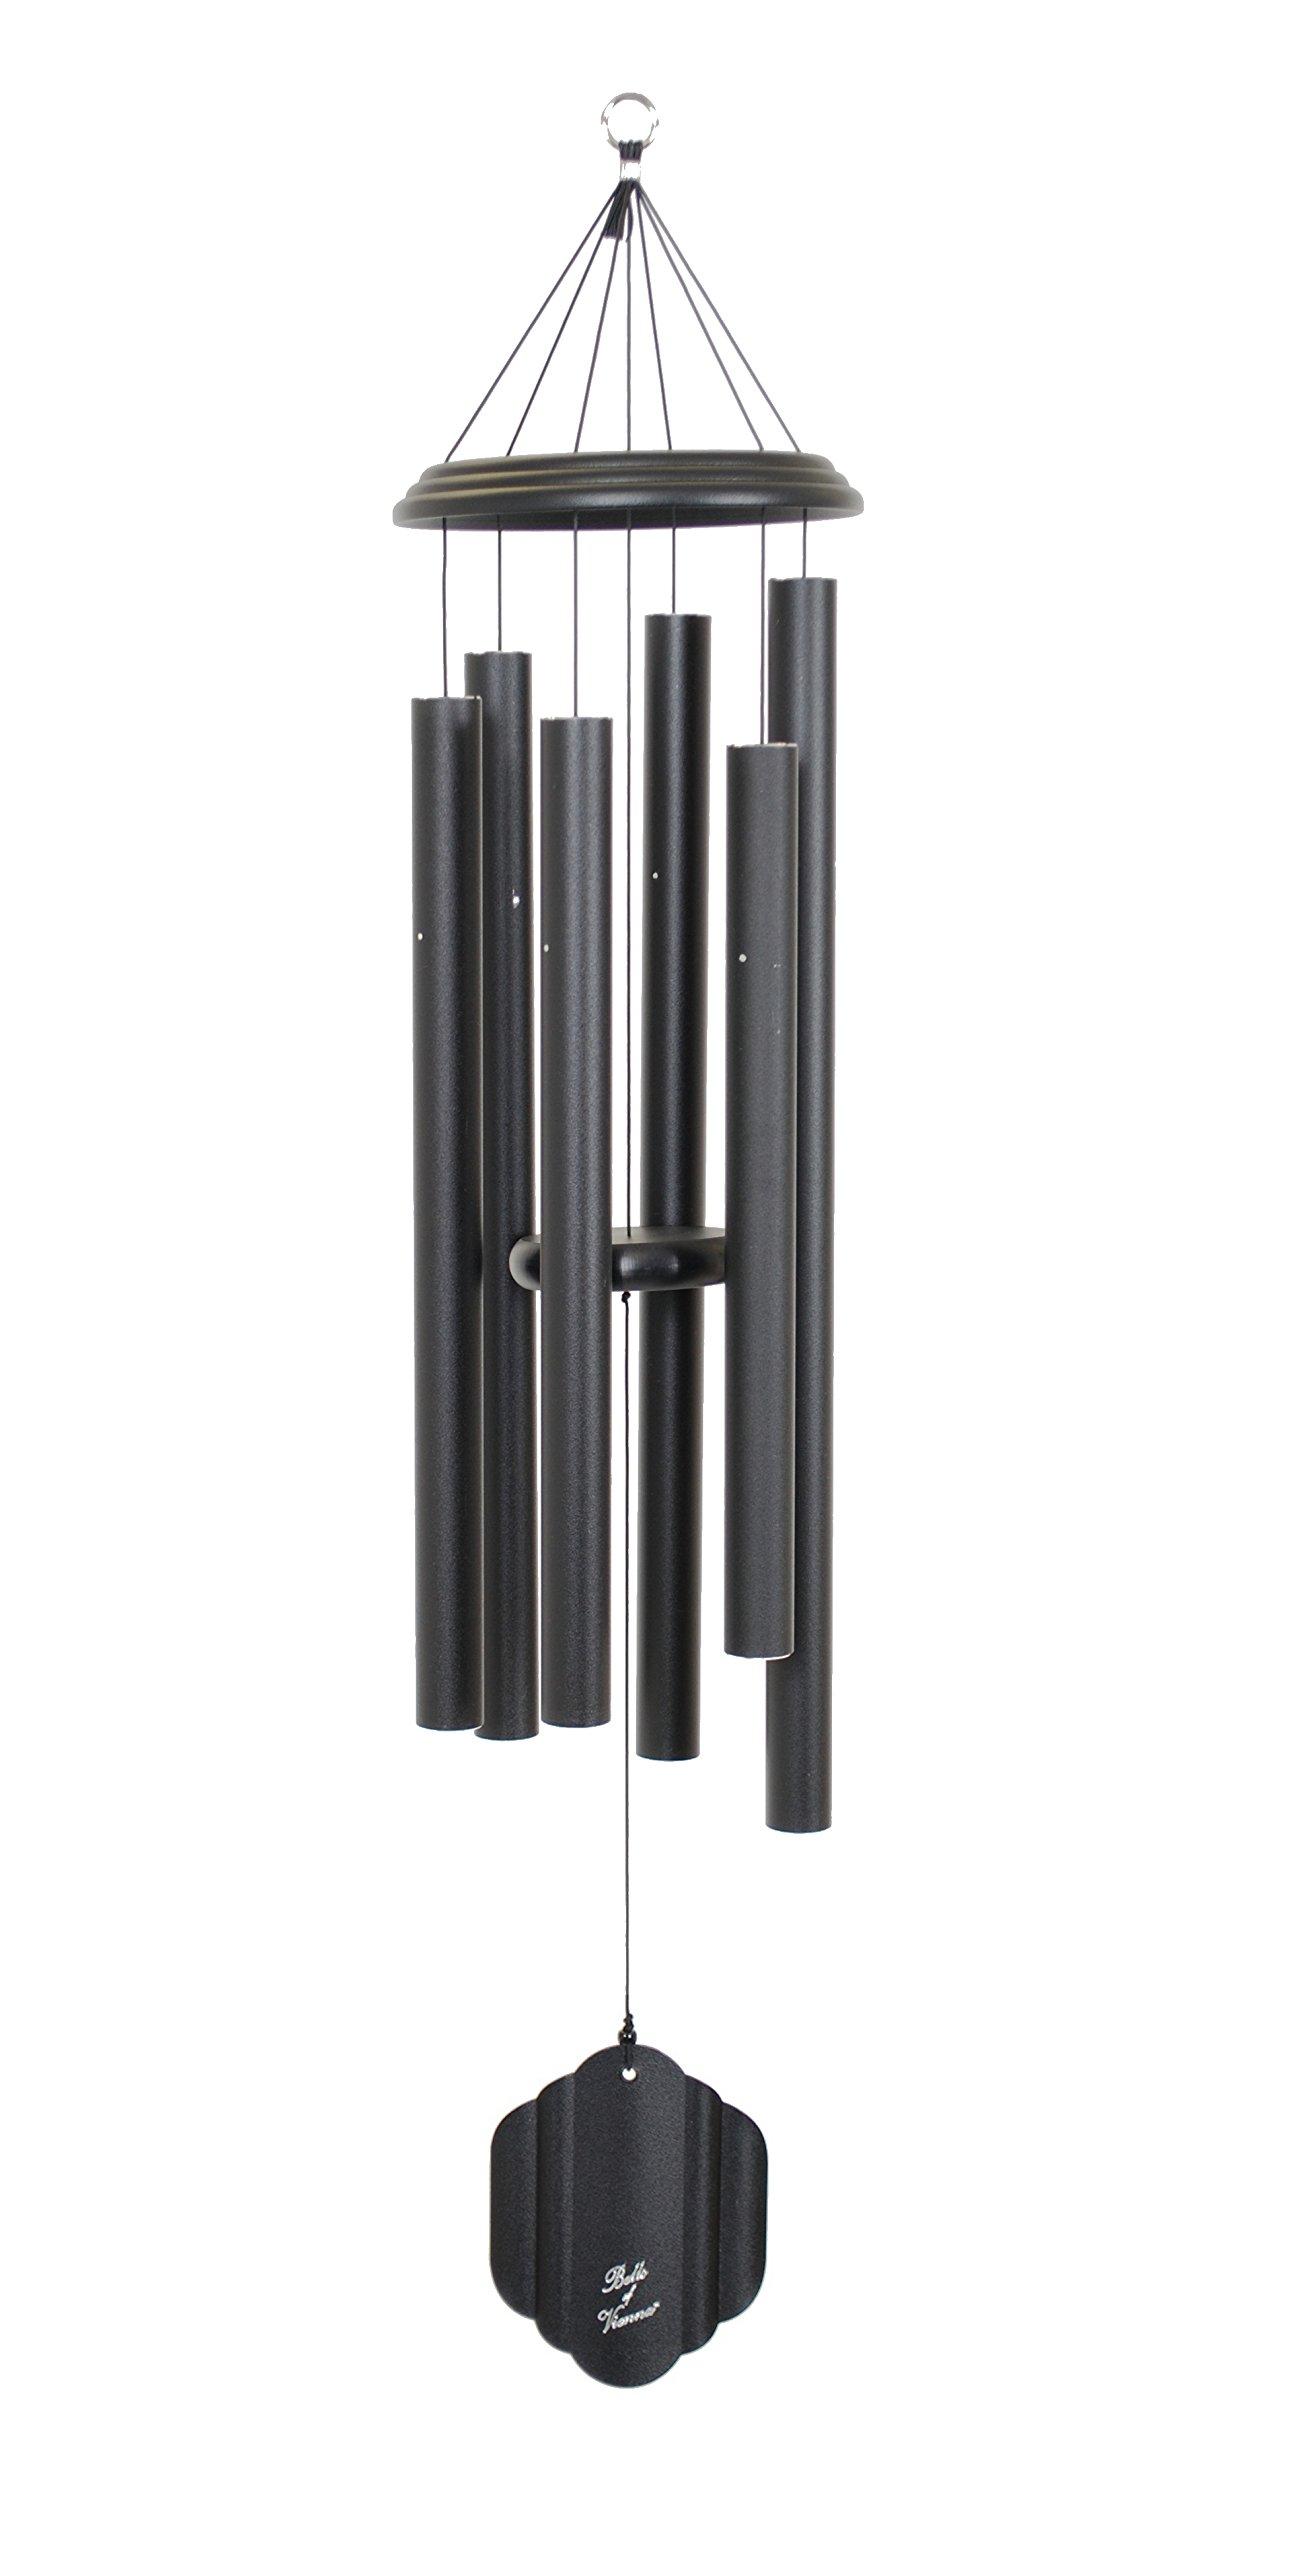 Bells of Vienna 50-inch Windchime, Black